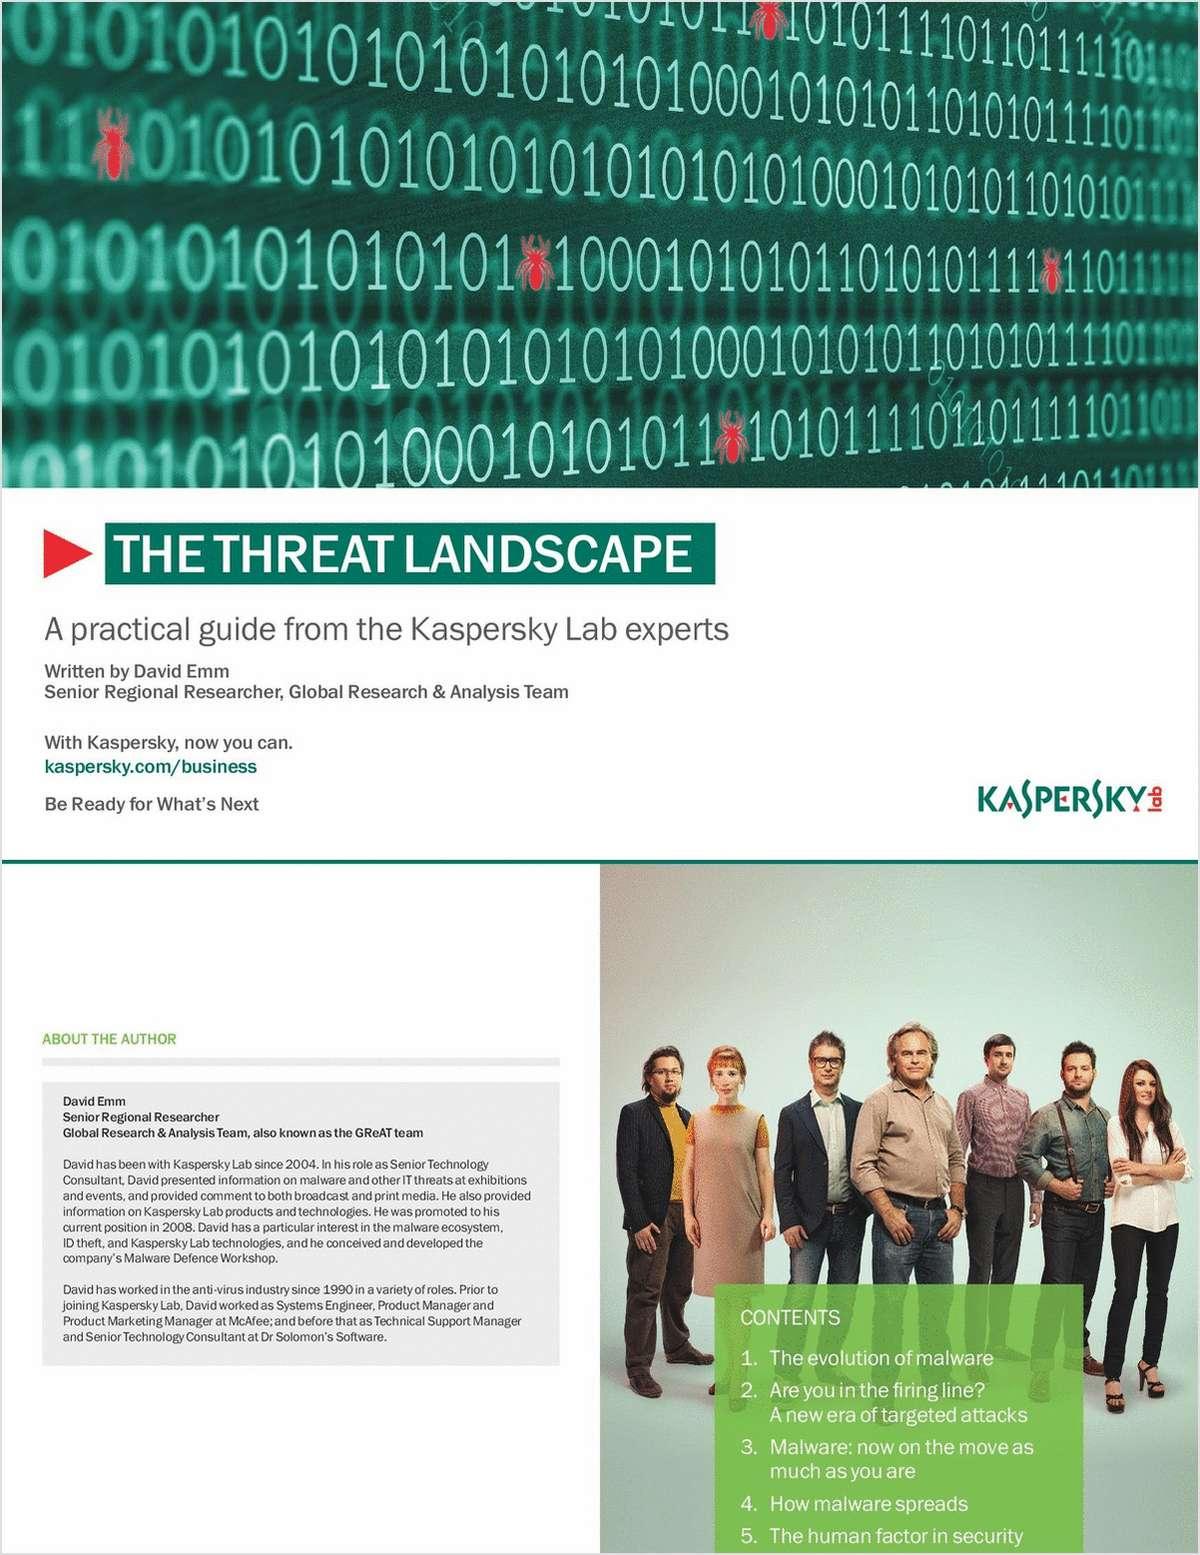 The Threat Landscape